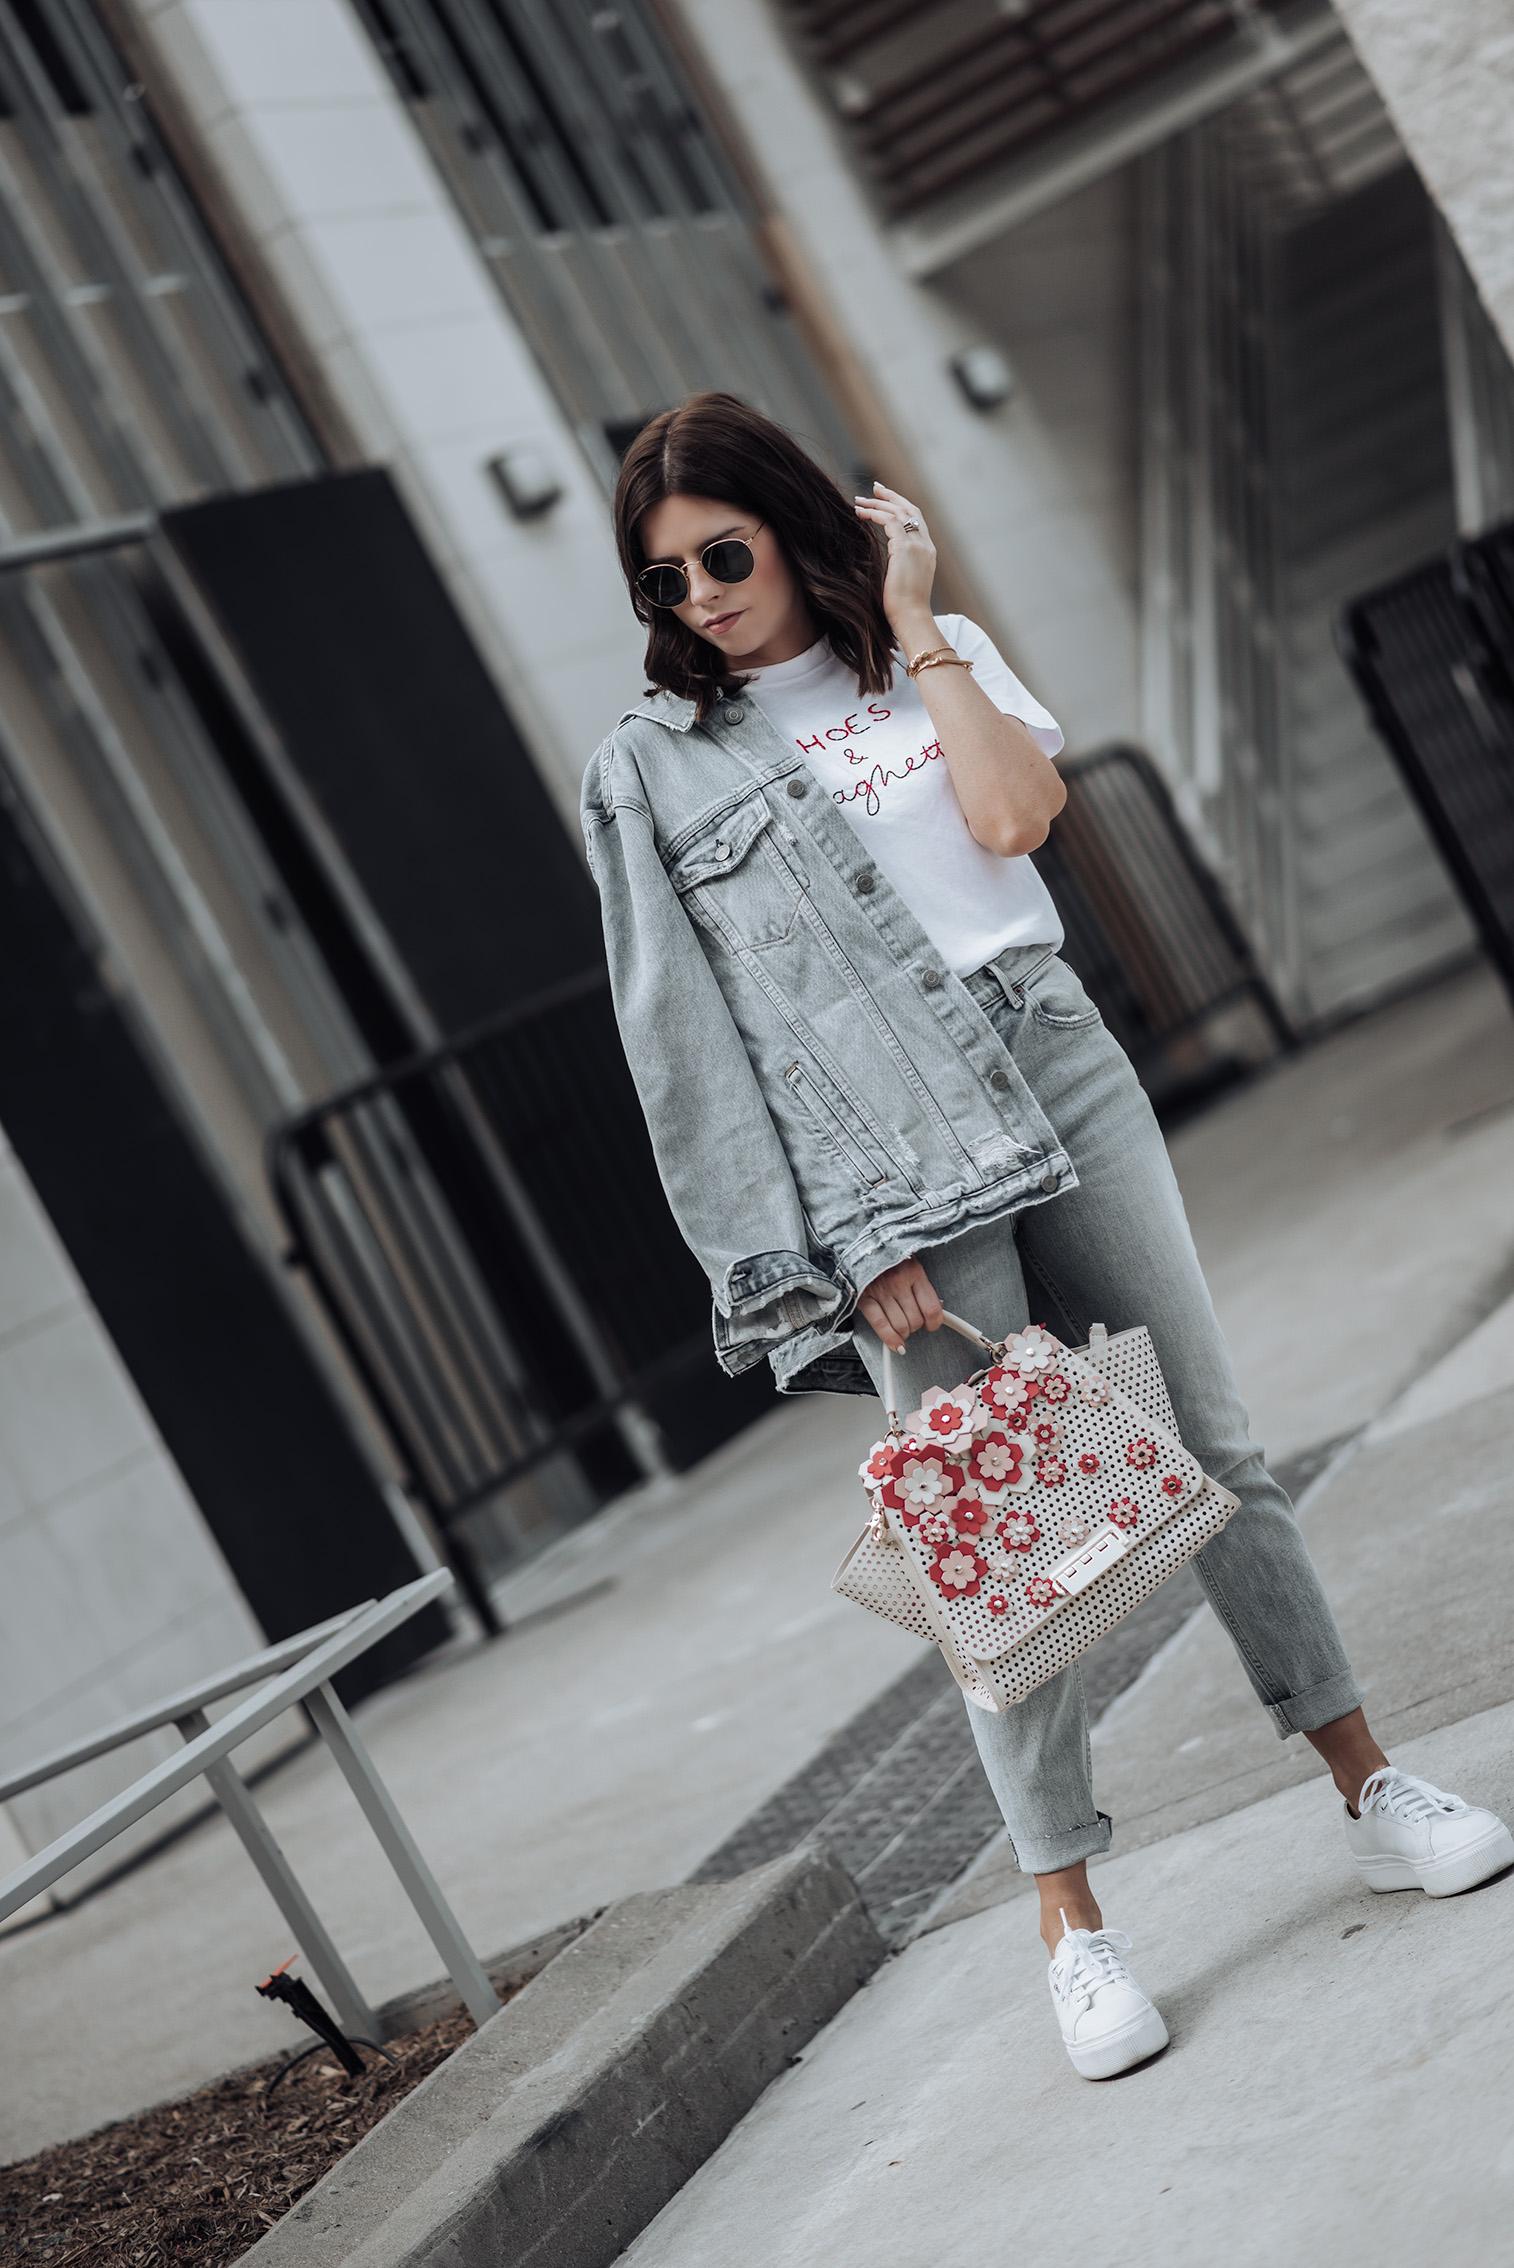 {C/O} GRLFRND Karolina Jeans   {C/O}GRLFRND Daria Denim Jacket   Zac Posen Bag   Shoes & Spaghetti T-Shirt   Superga Platform Sneakers   #streetstyle #liketkit #Revolve #denimoutfits